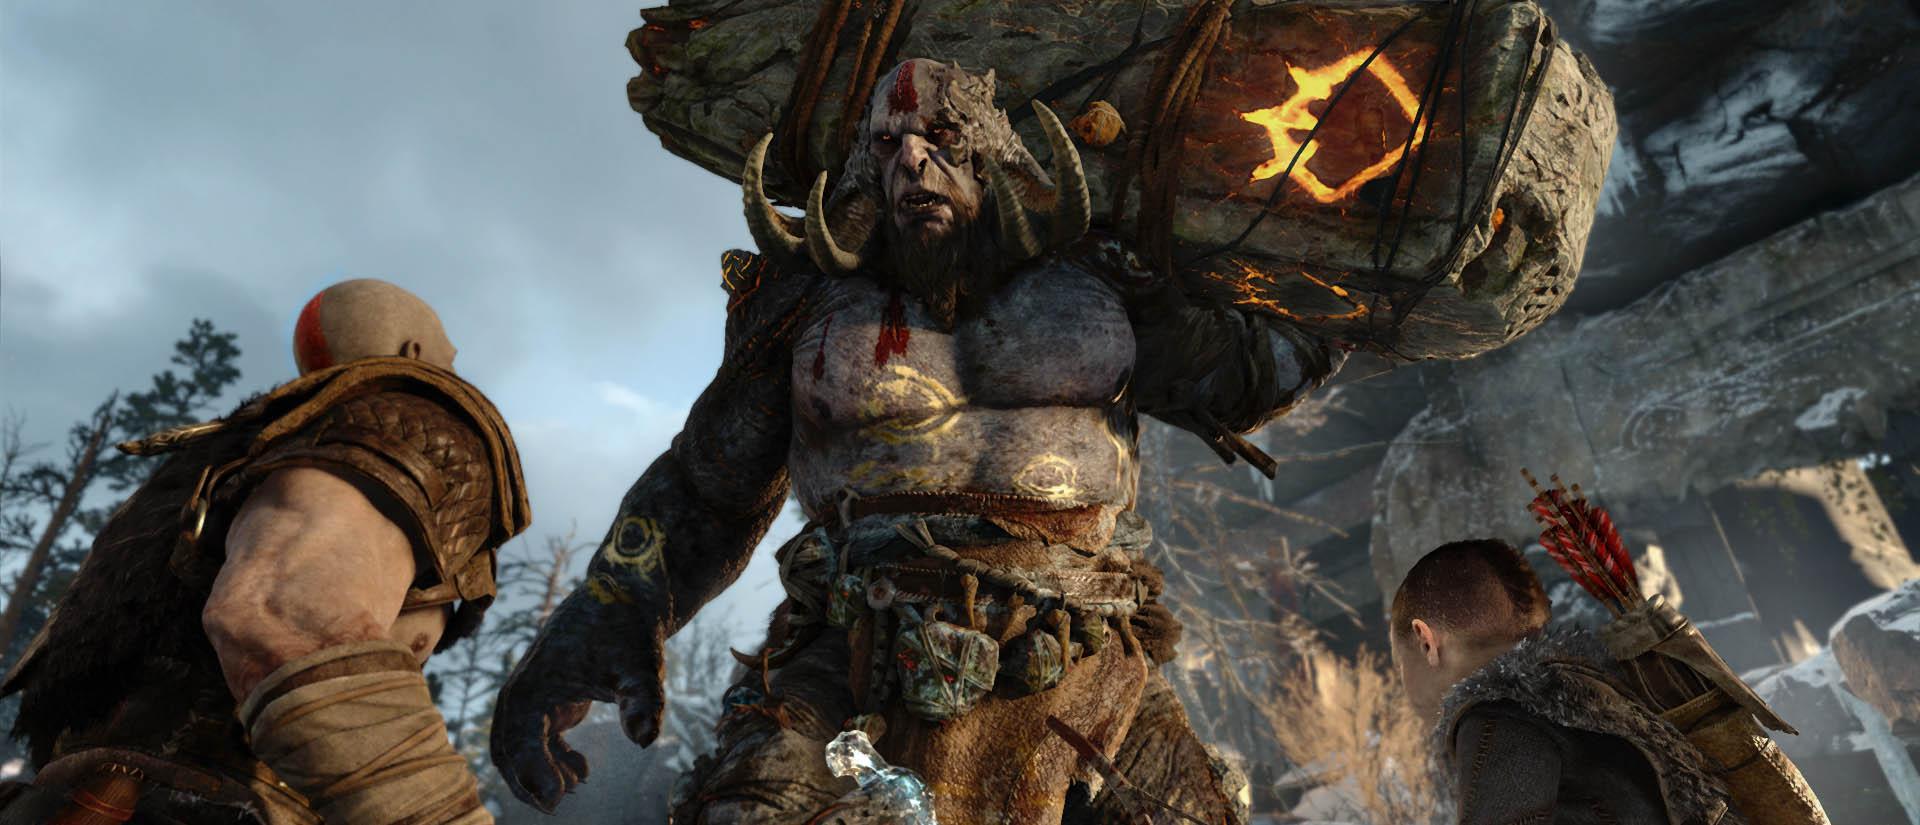 God of War Dokumentation erhält Release